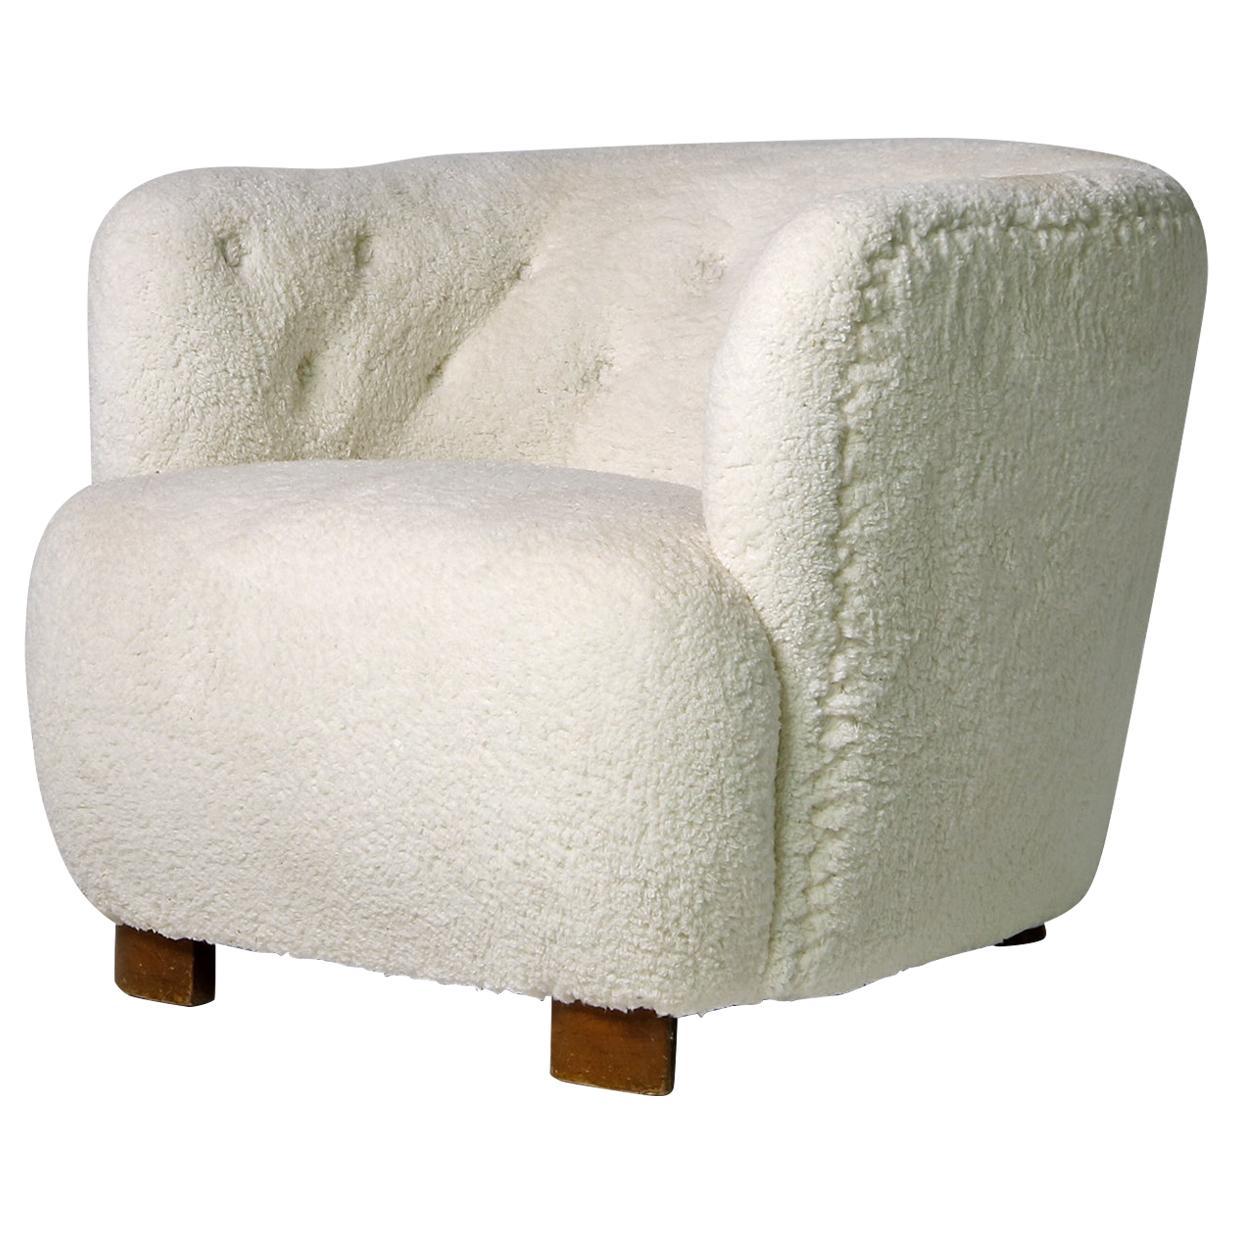 Danish Modern Clam Chair, Lounge, 1950s Teddy Fur & Leather, Sheepskin, Denmark